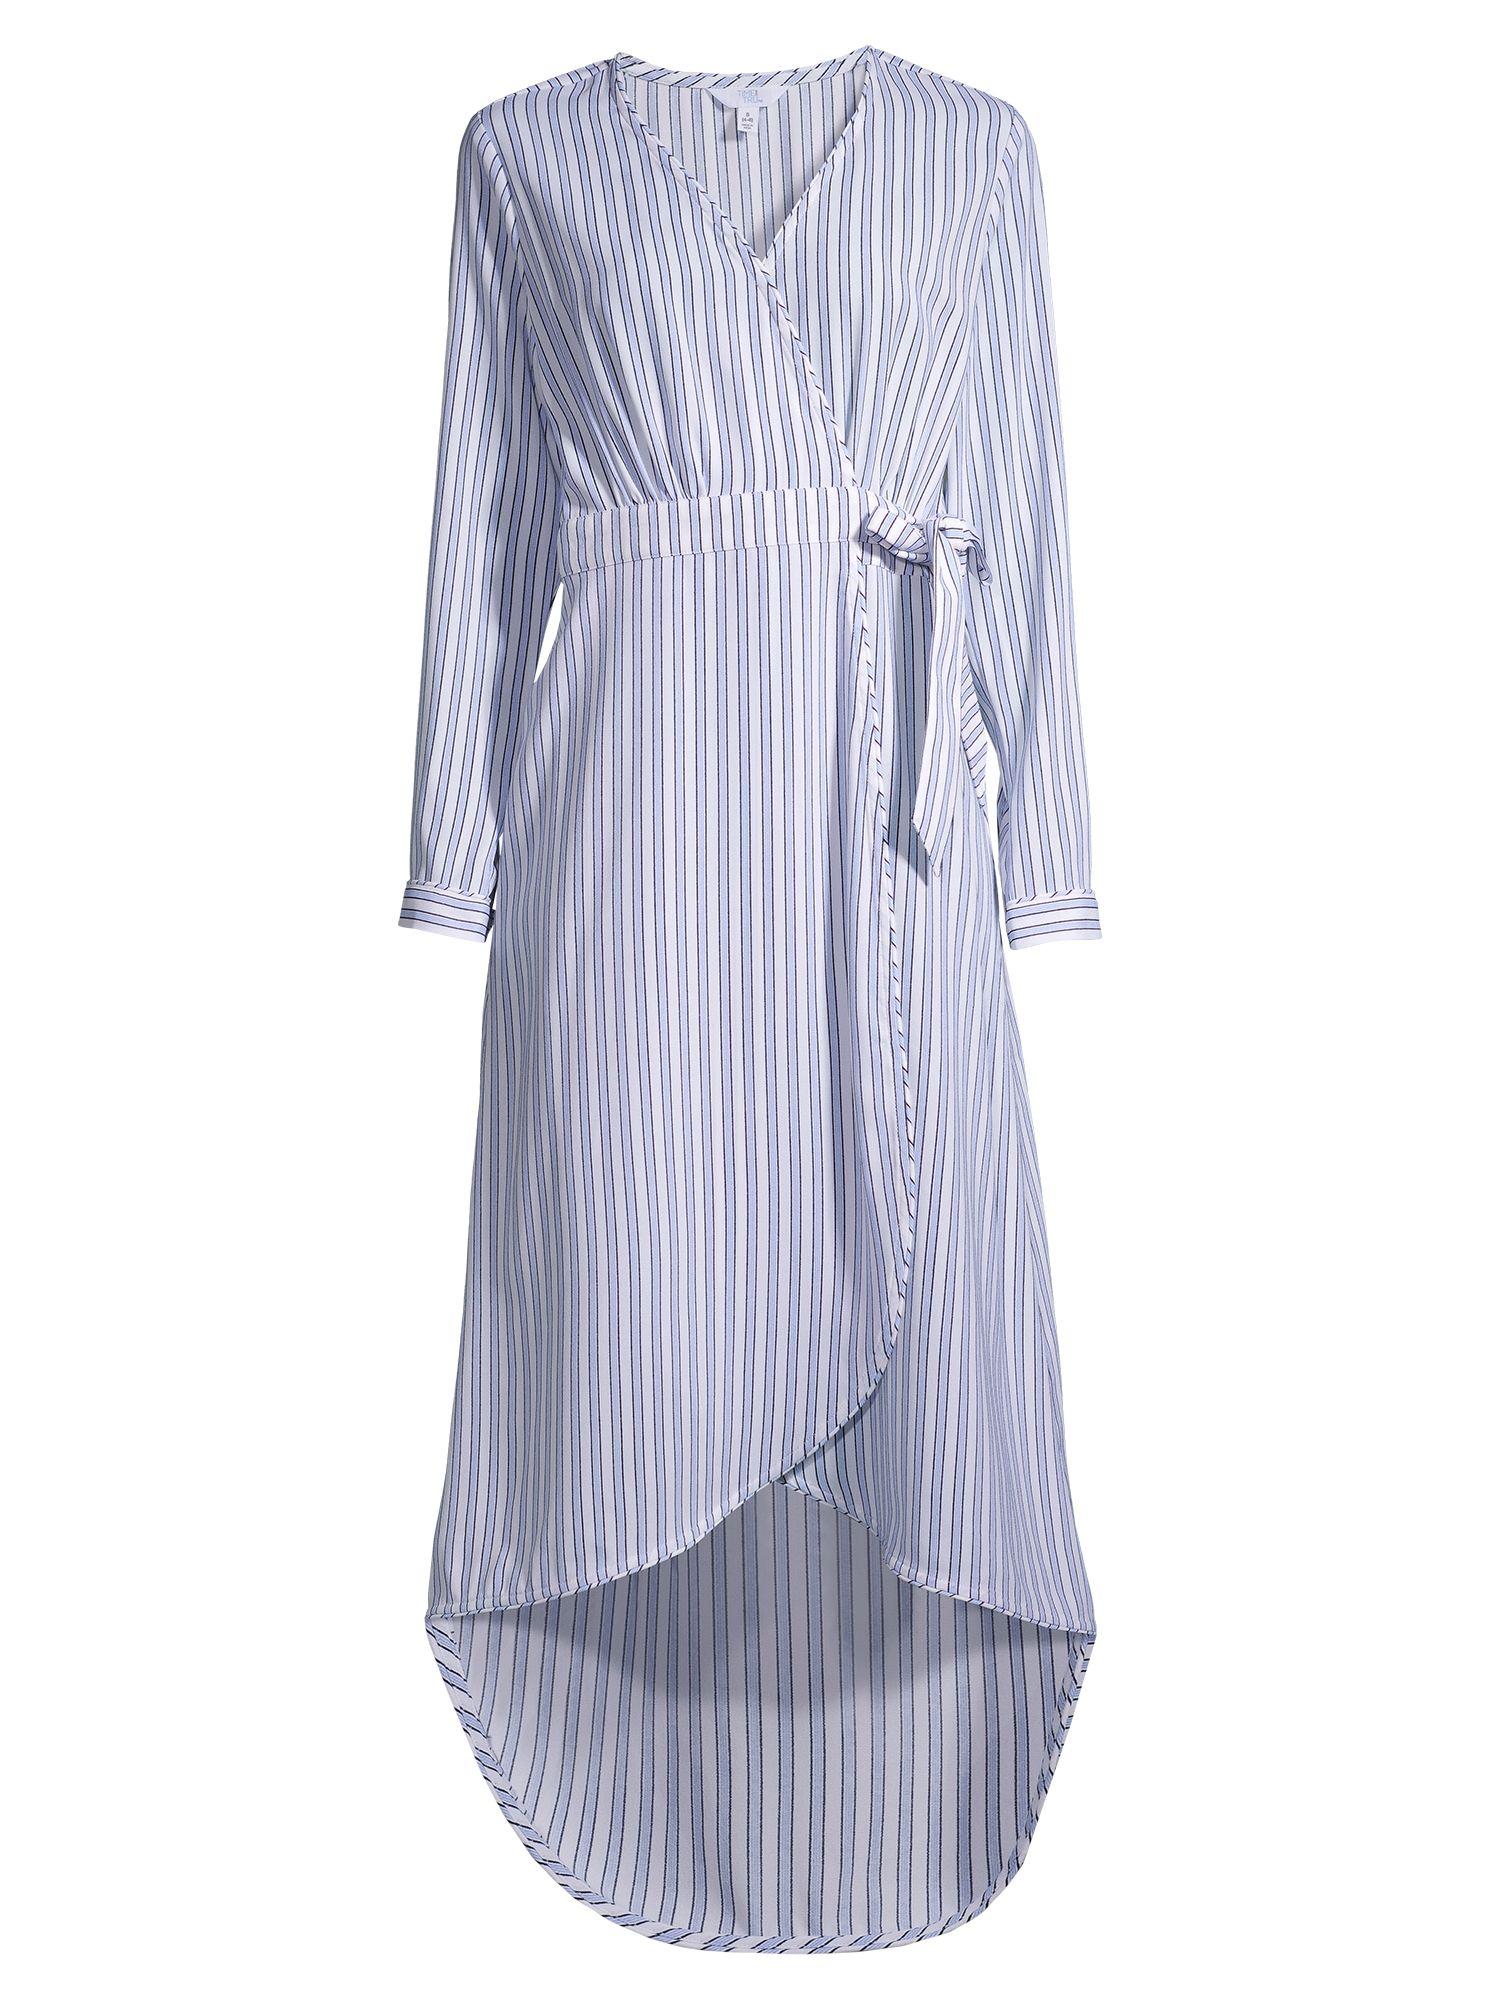 Time And Tru Time And Tru Women S Long Sleeve Faux Wrap Dress Walmart Com Wrap Dress Women Long Sleeve Dresses [ 2000 x 1500 Pixel ]